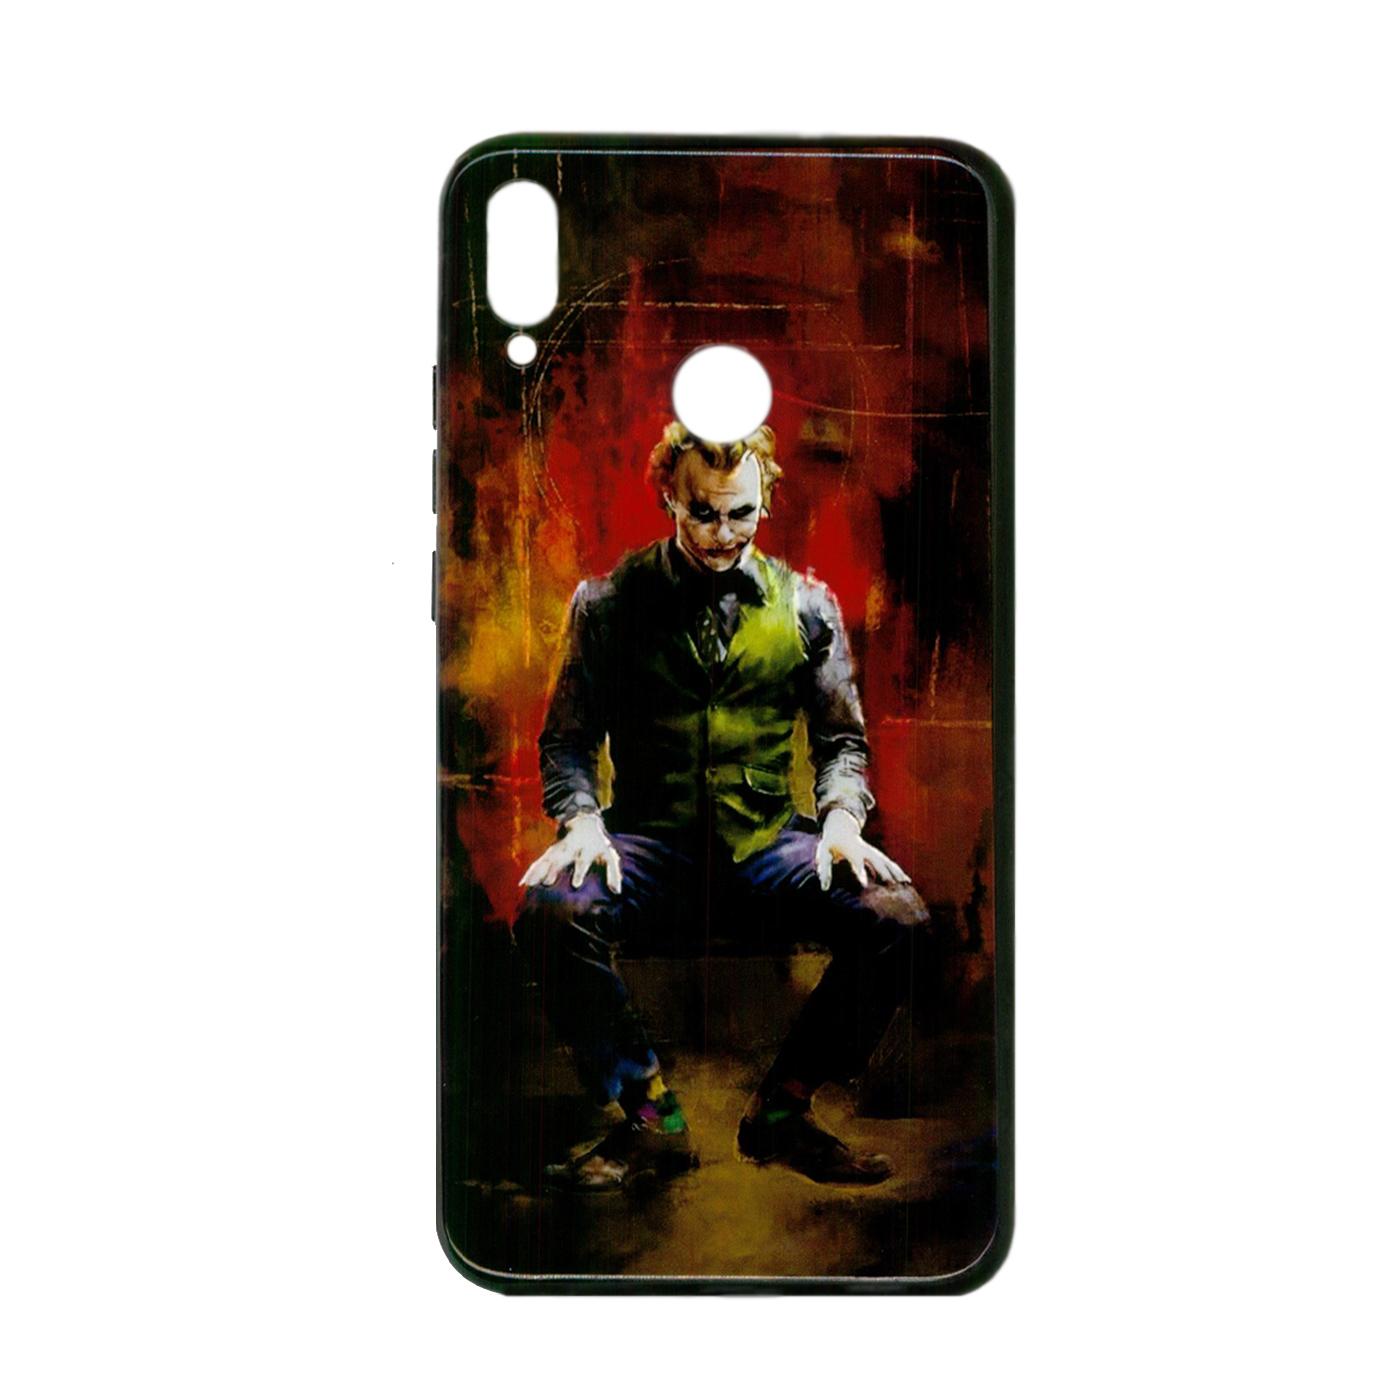 کاور طرح Joker کد 3334 مناسب برای گوشی موبایل آنر 8X